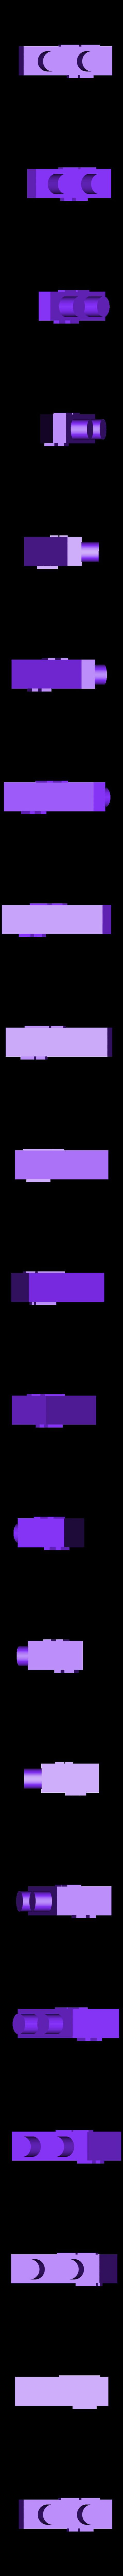 fun_chm1_1.stl Download free STL file Ripper's London - Funeral Parlour / Shop • 3D print template, Earsling